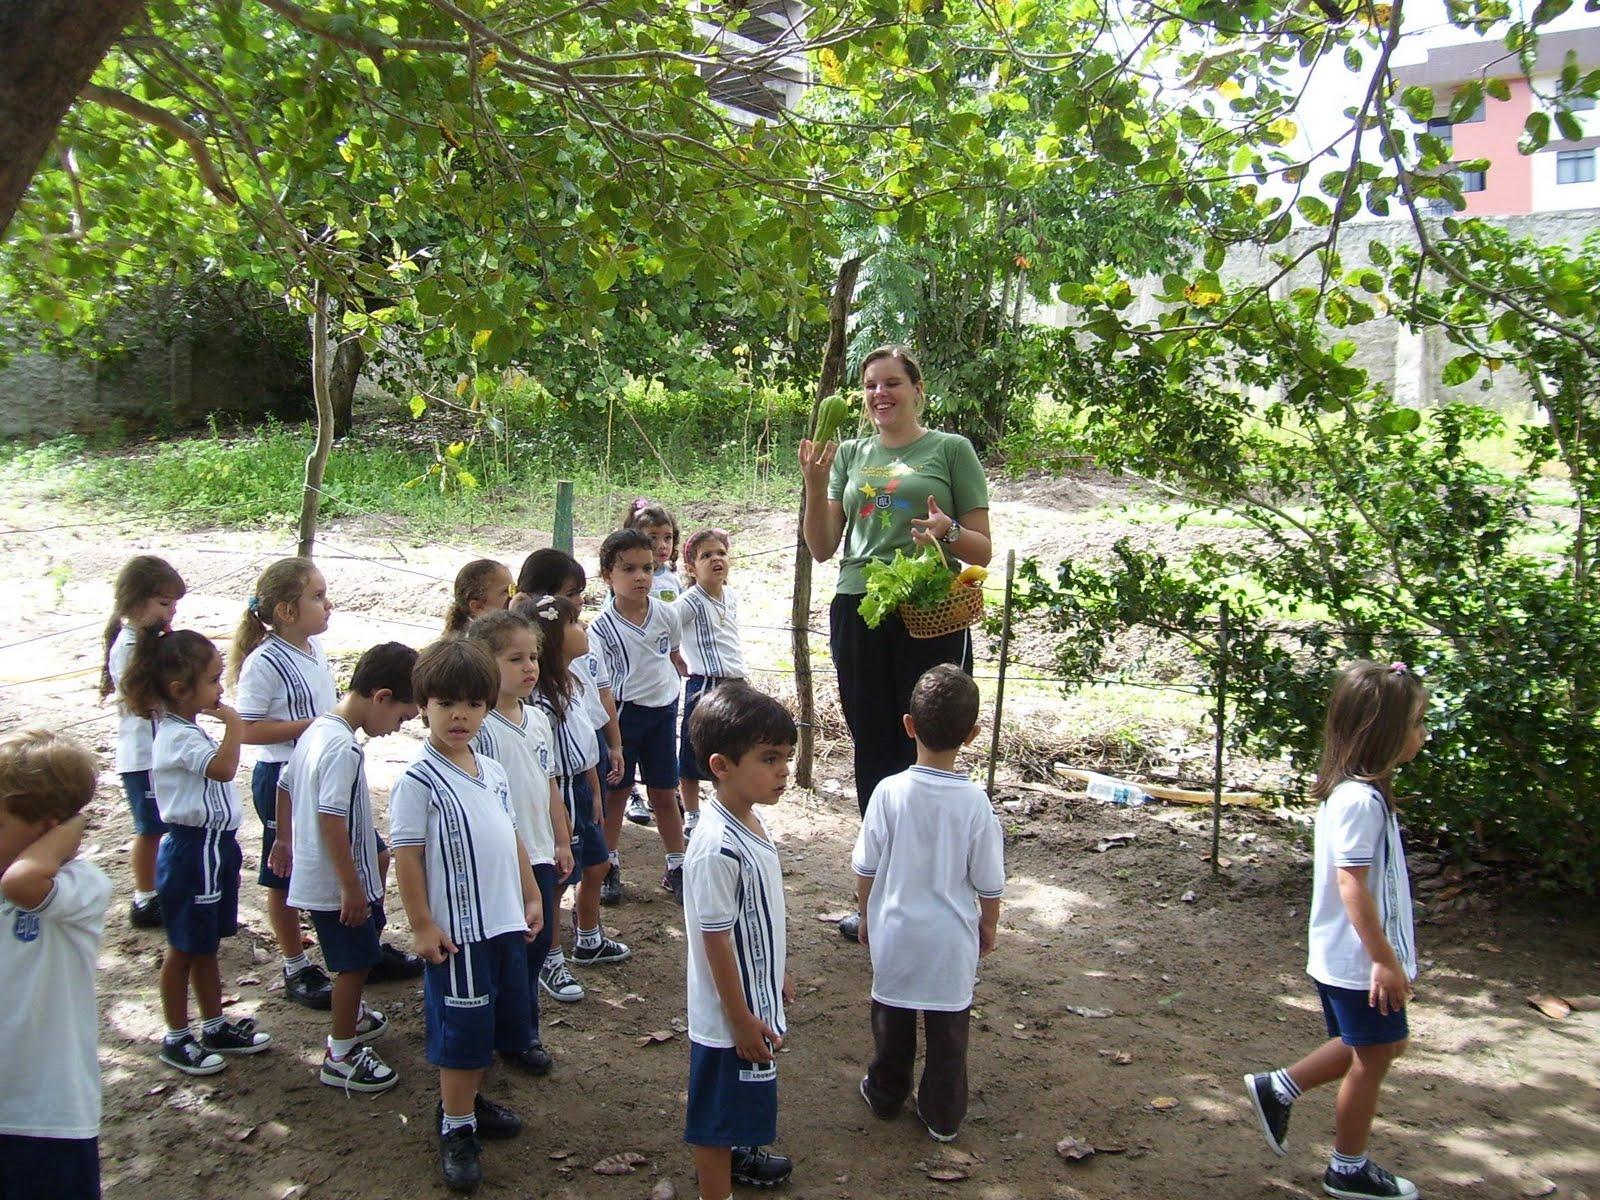 horta jardim e pomar:Blog da Turminha EVL: Horta, Pomar e Jardim – Lego